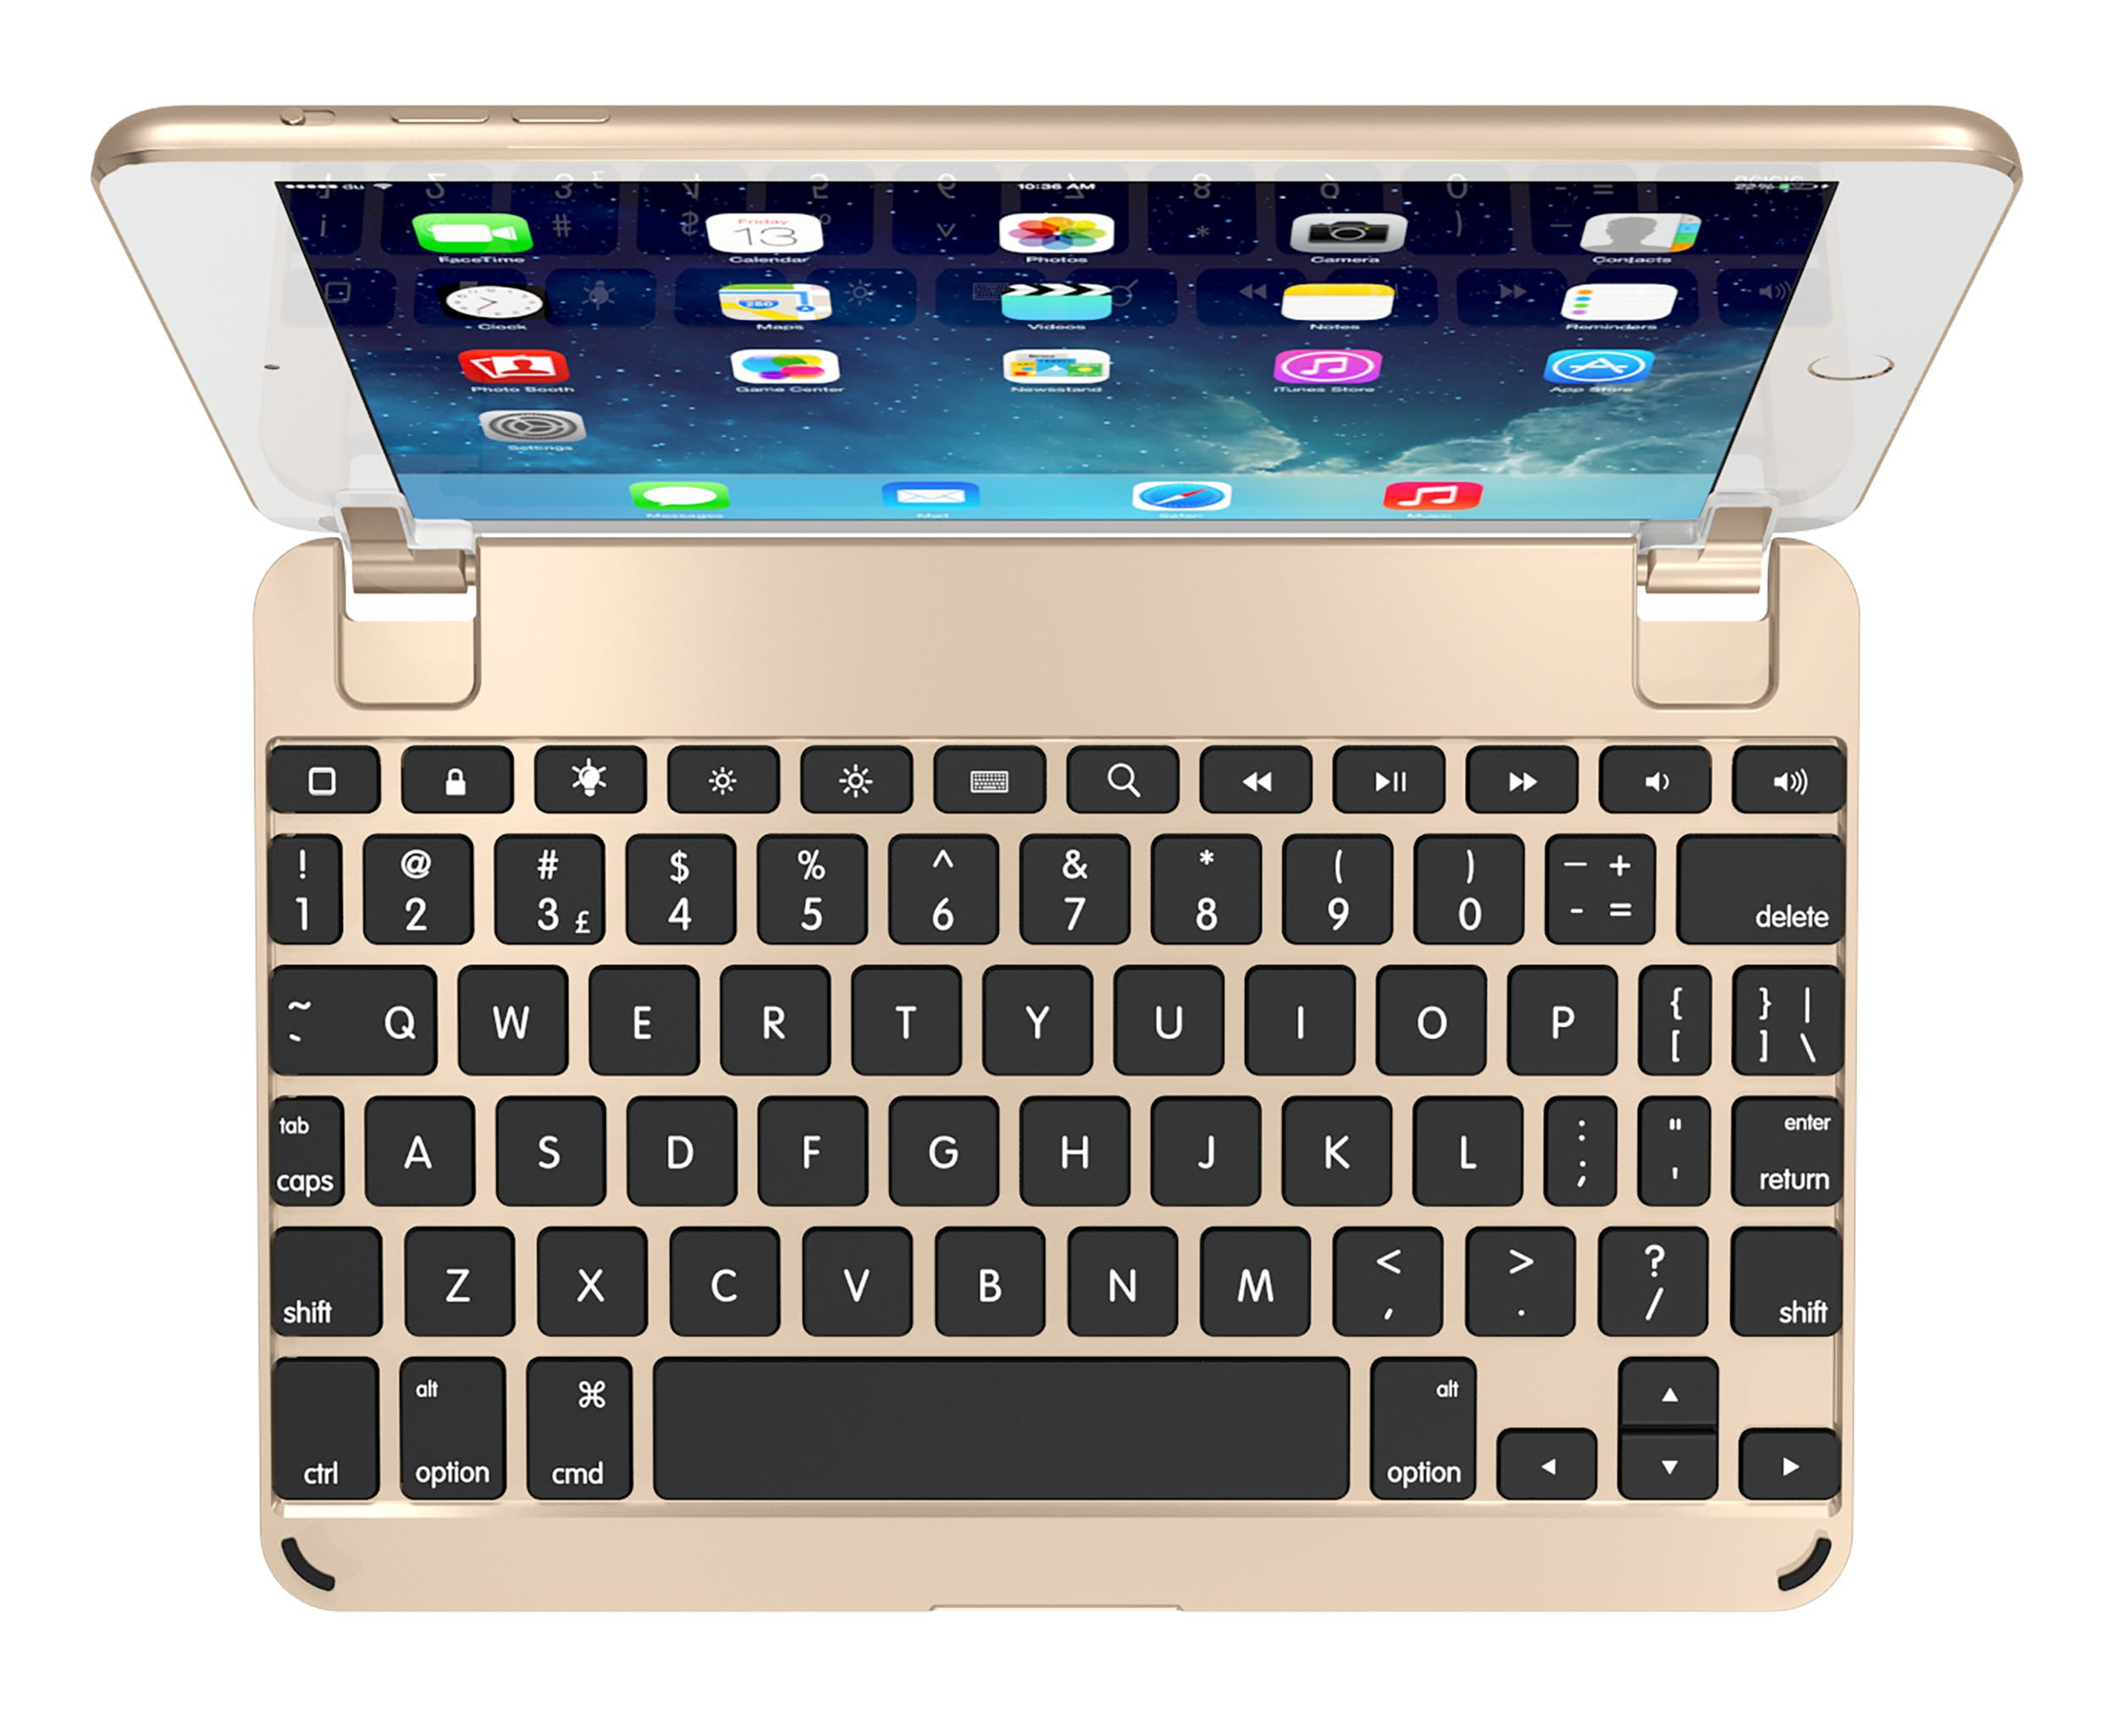 BrydgeMini Bluetooth iPad Mini 1,2 and 3 Keyboard. Backlit, Aluminum, Detachable, Rotating Hinges, 180 Degree Viewing. (Gold)